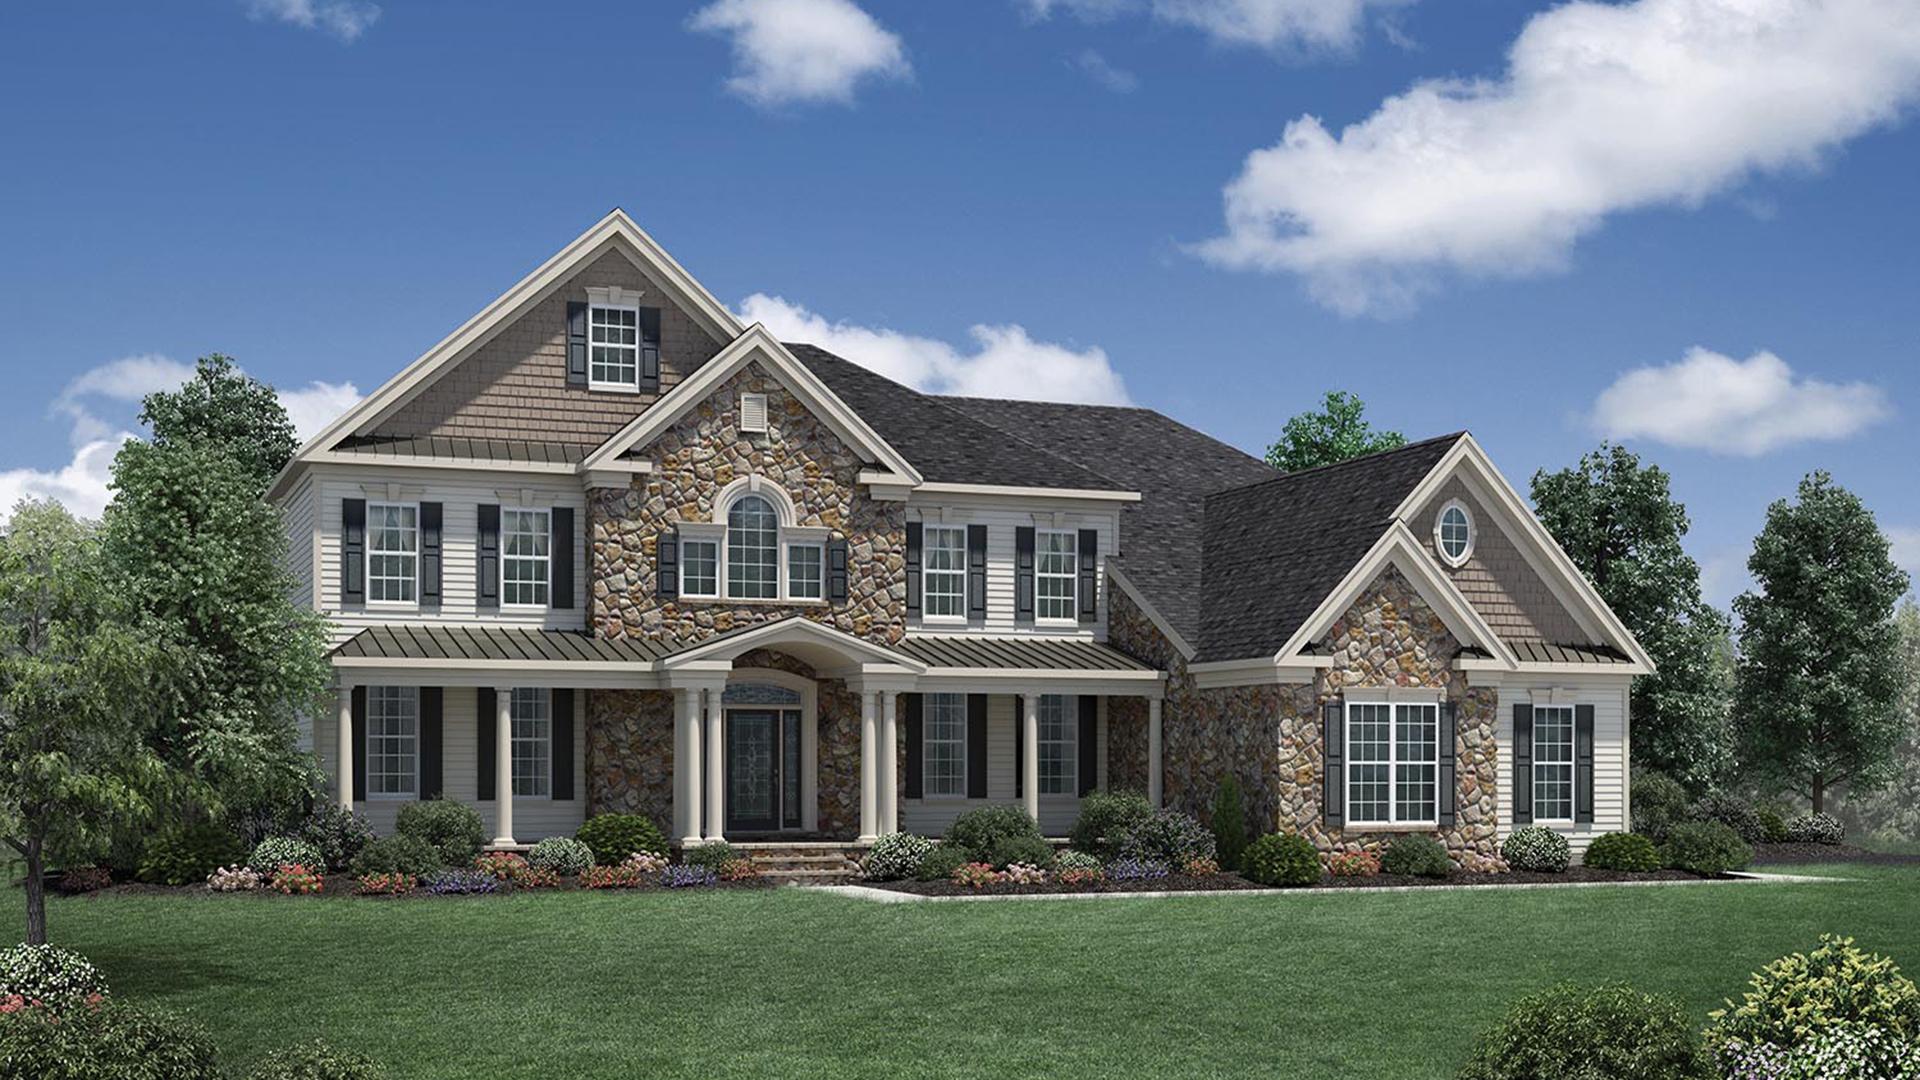 hampton - Hampton Home Designs